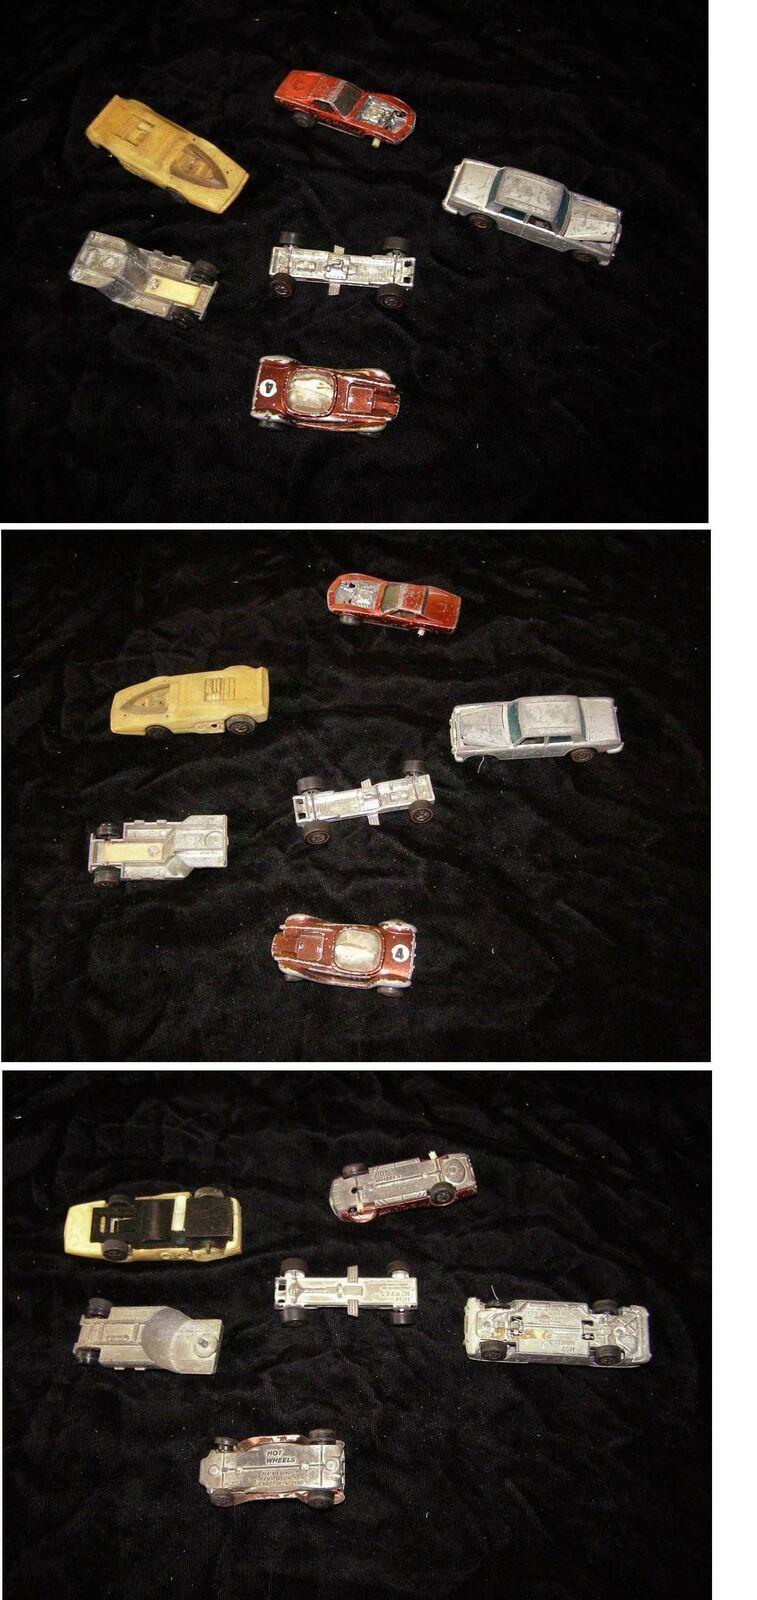 Mattel Hot Wheels Vintage Toy Car Lot Redline Sizzlers Diecast For Parts